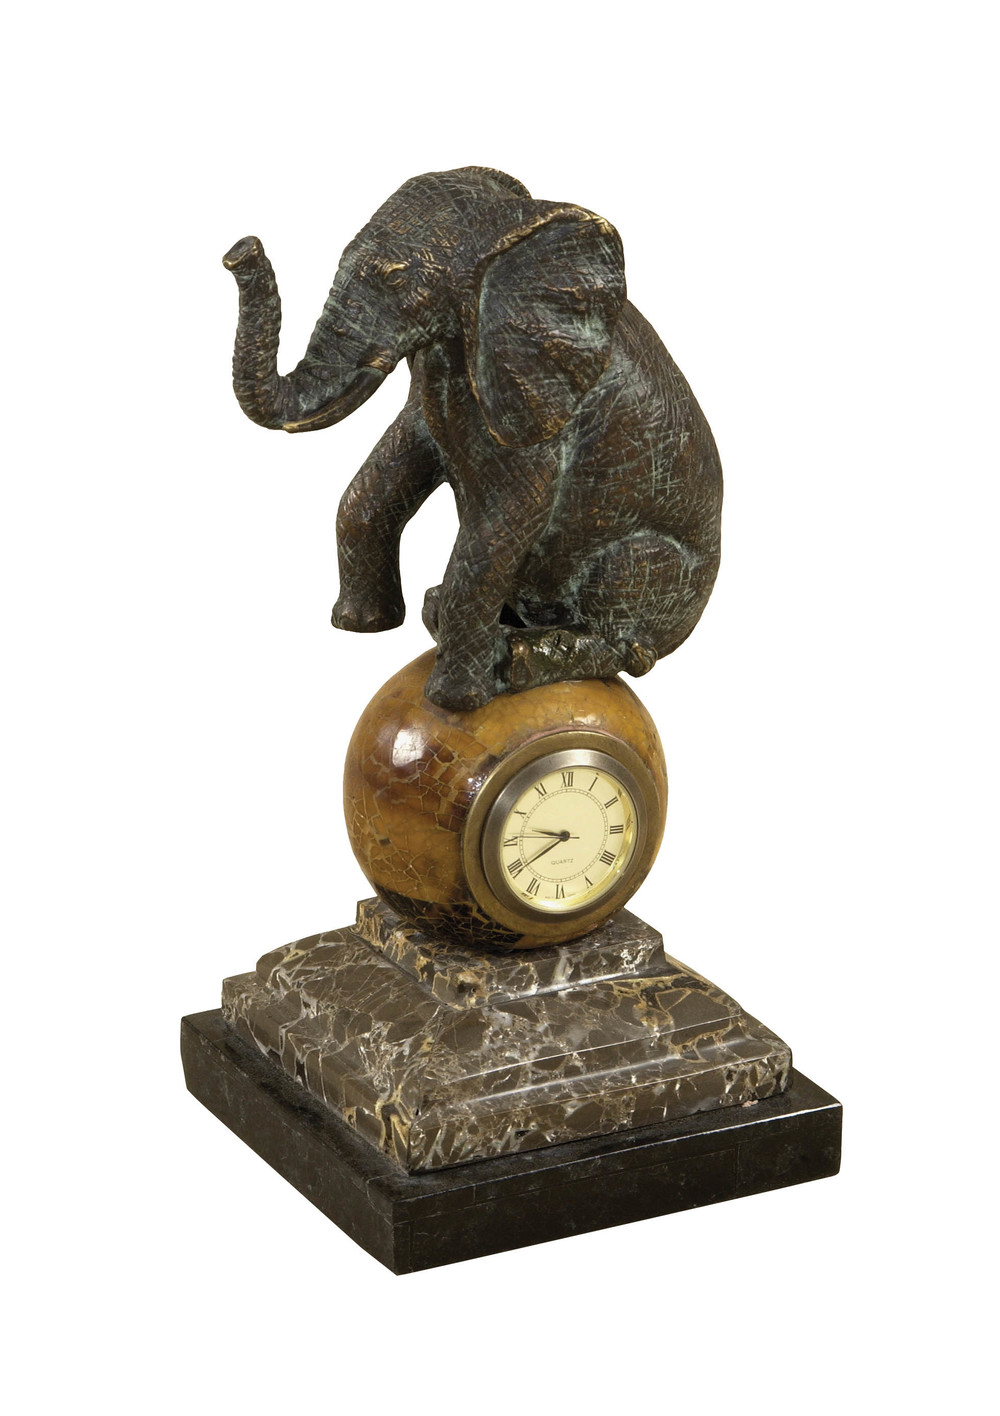 Maitland-Smith - Verdigris Cast Brass Elephant Table Top Clock